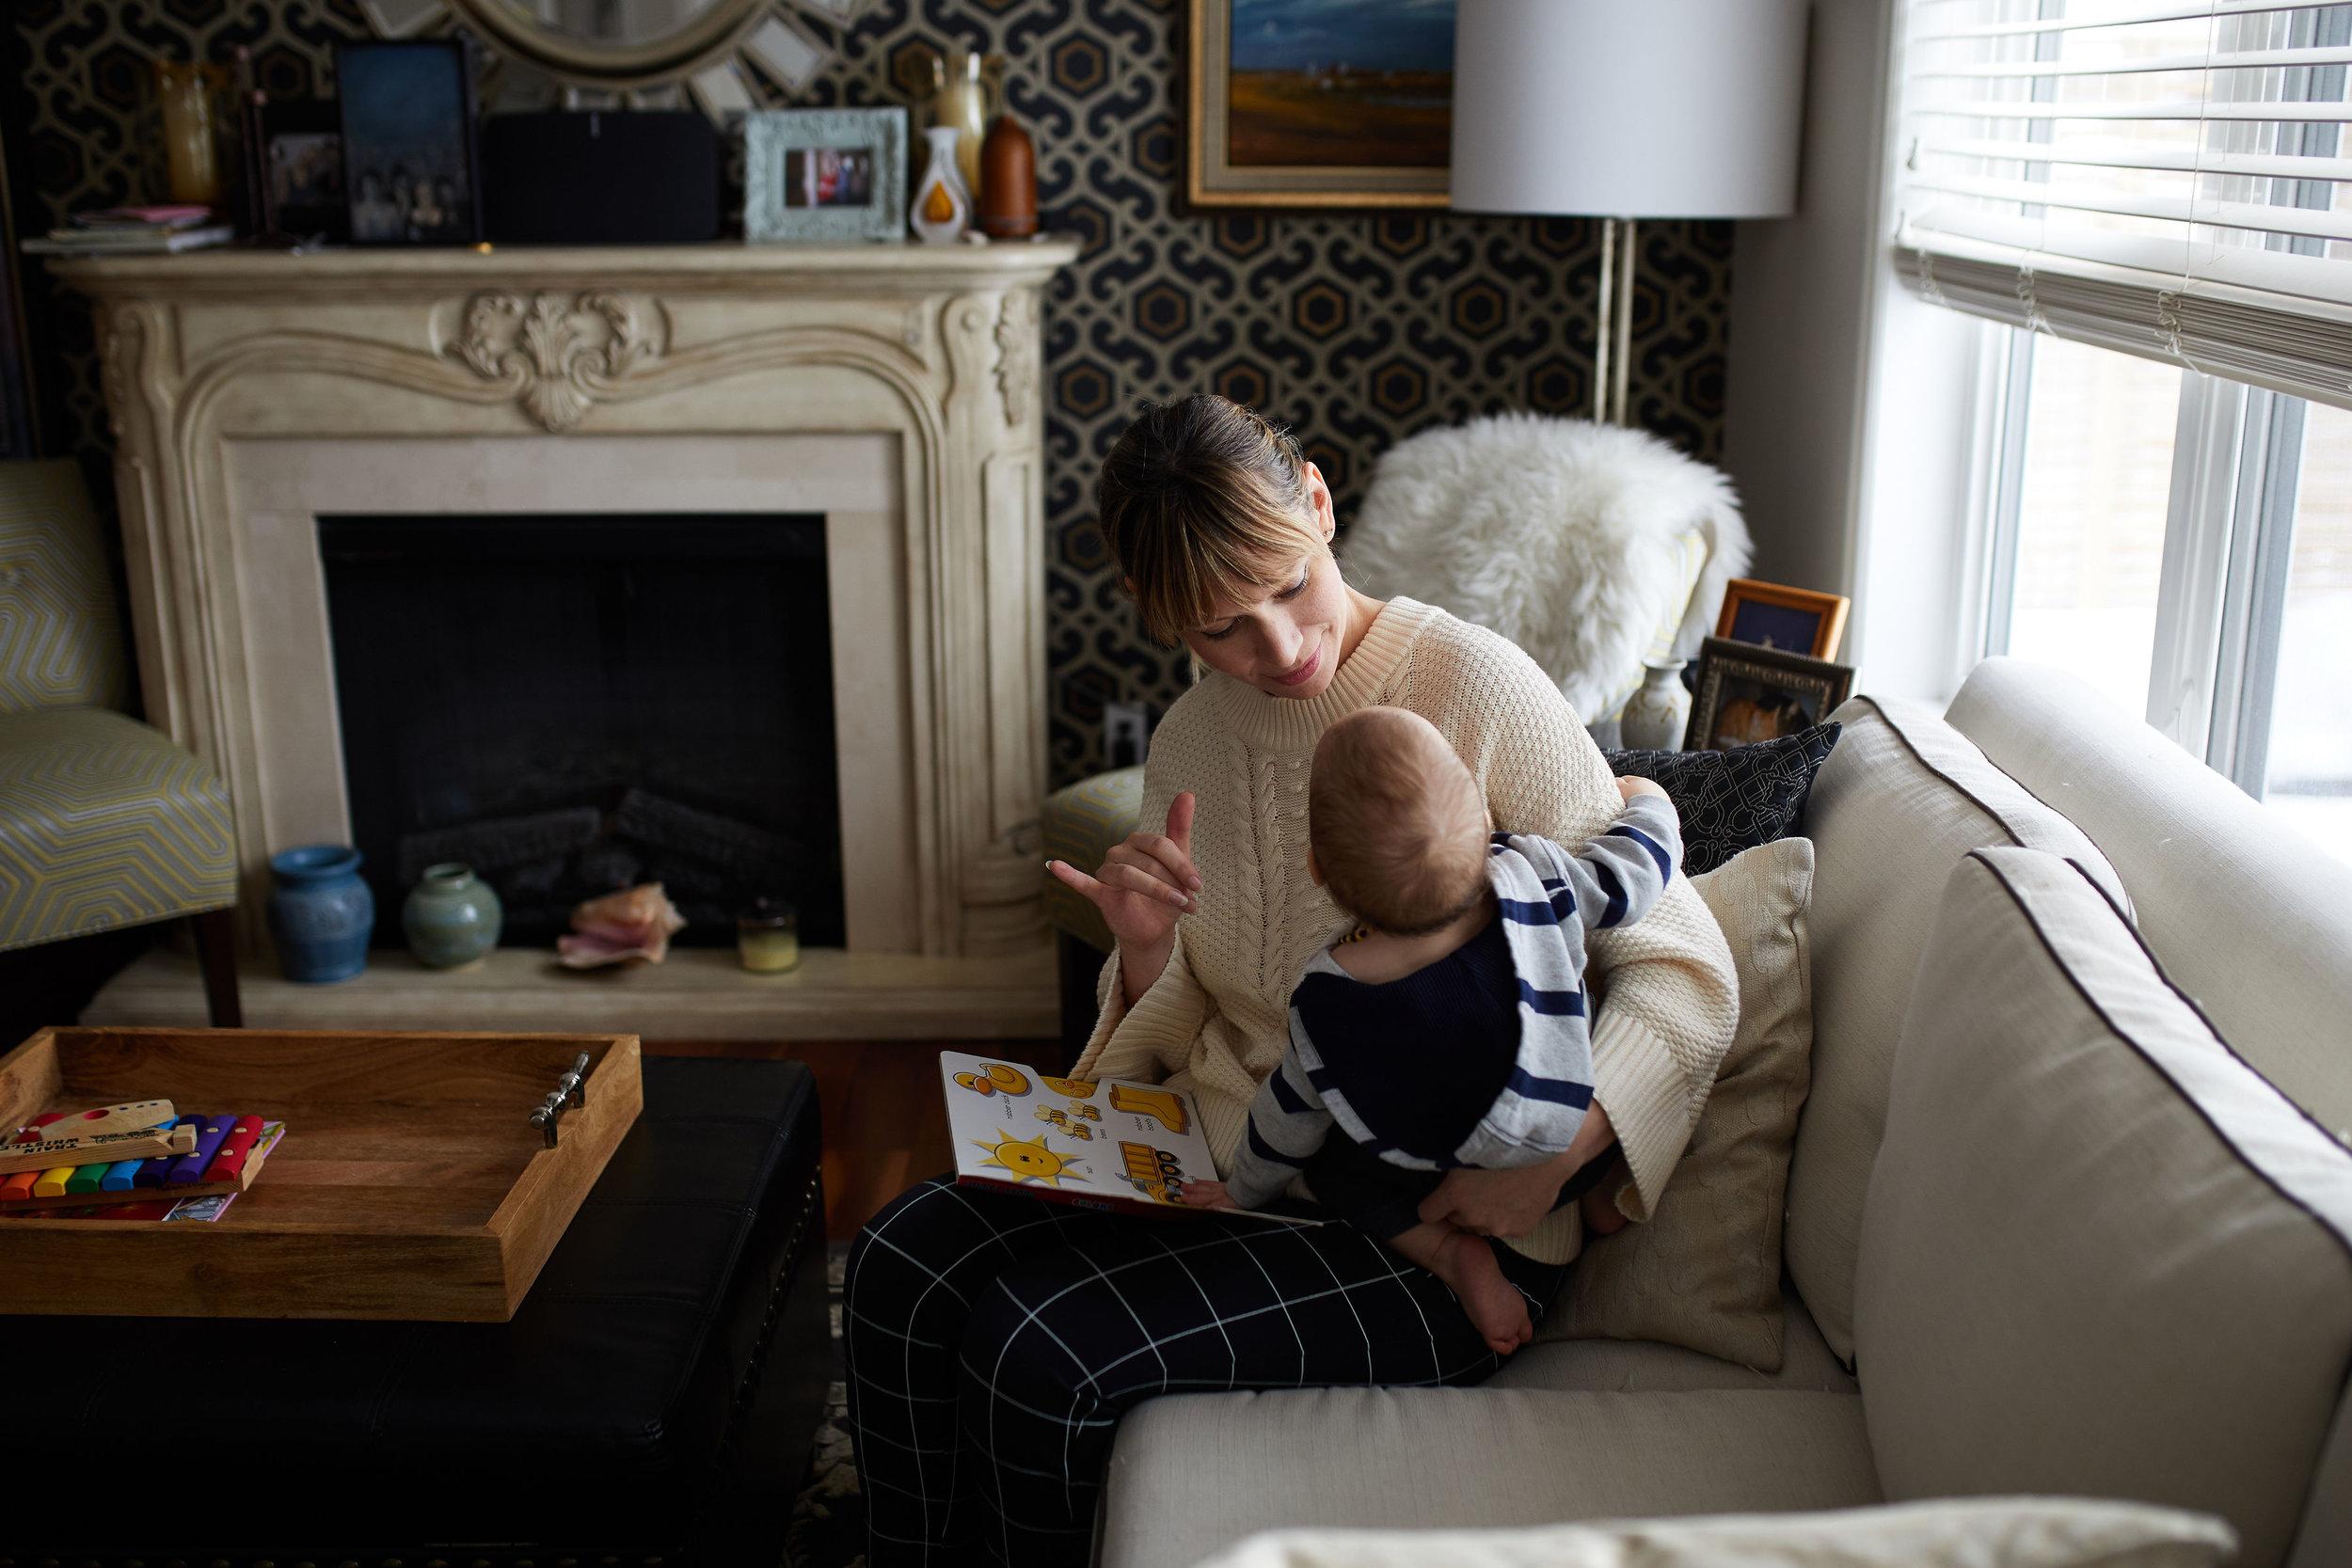 saskatoon mom blog baby sign language photo by nicole romanoff